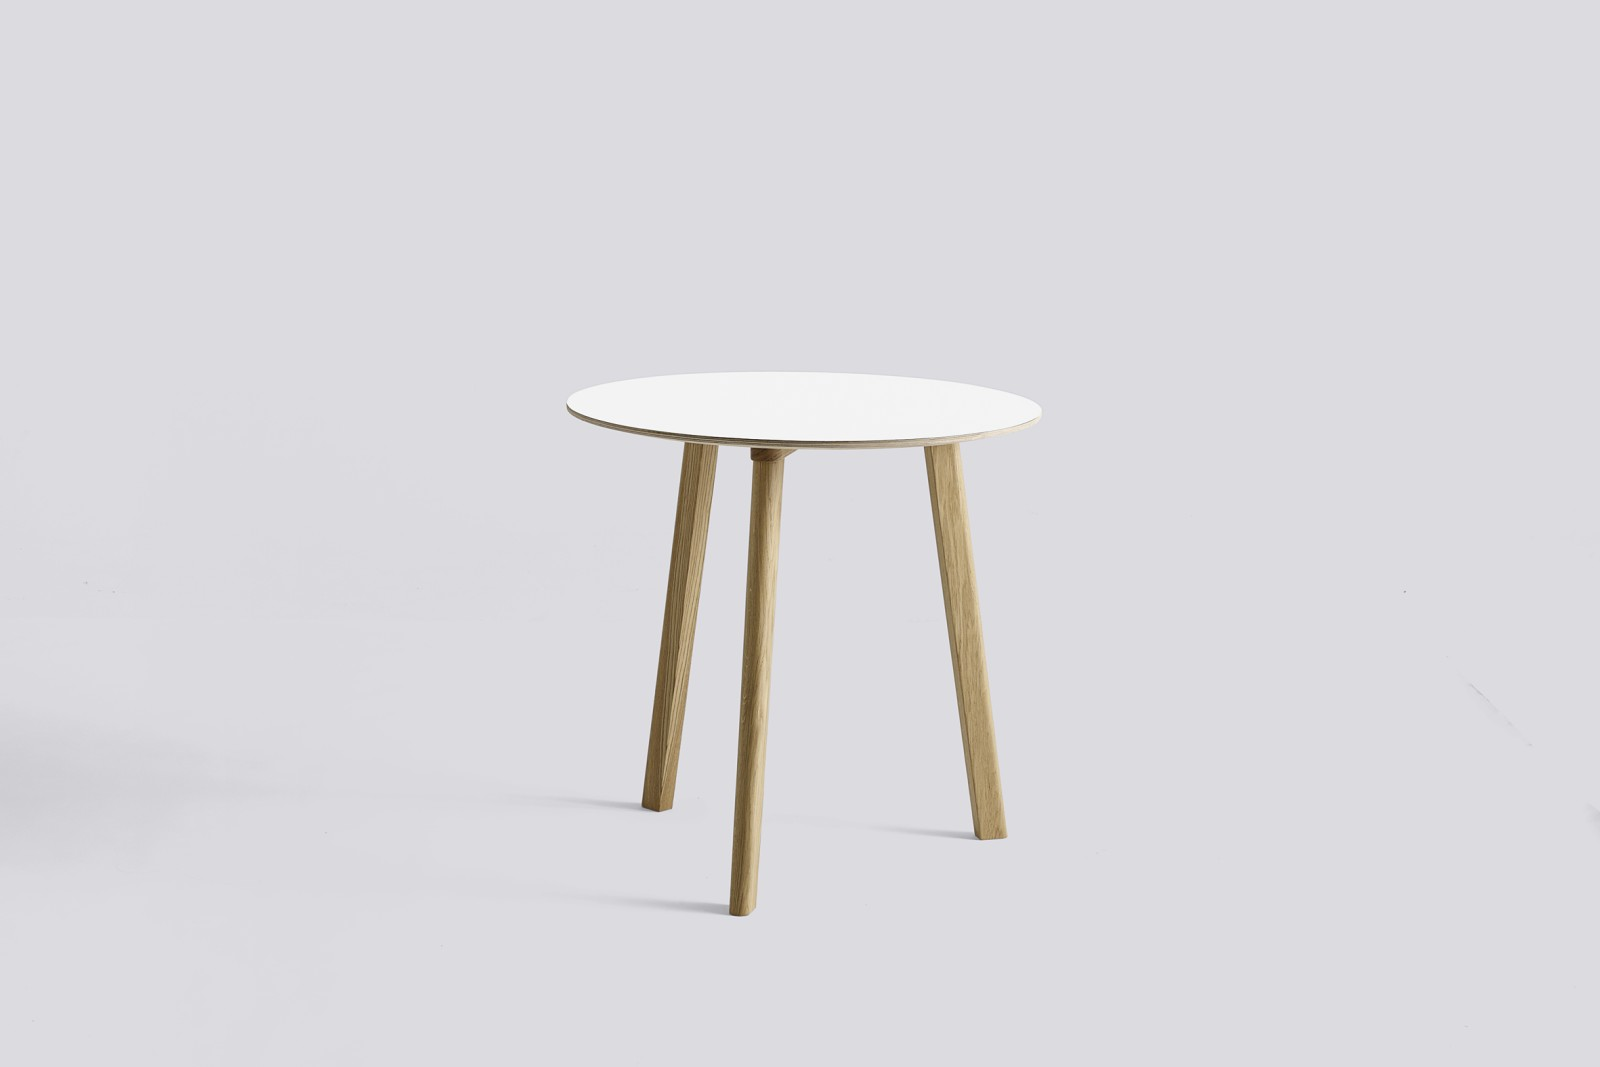 Copenhague Deux (CPH 220) Round Dining Table Pearl White Laminate Top, Matt Lacquered Beech Base, 75